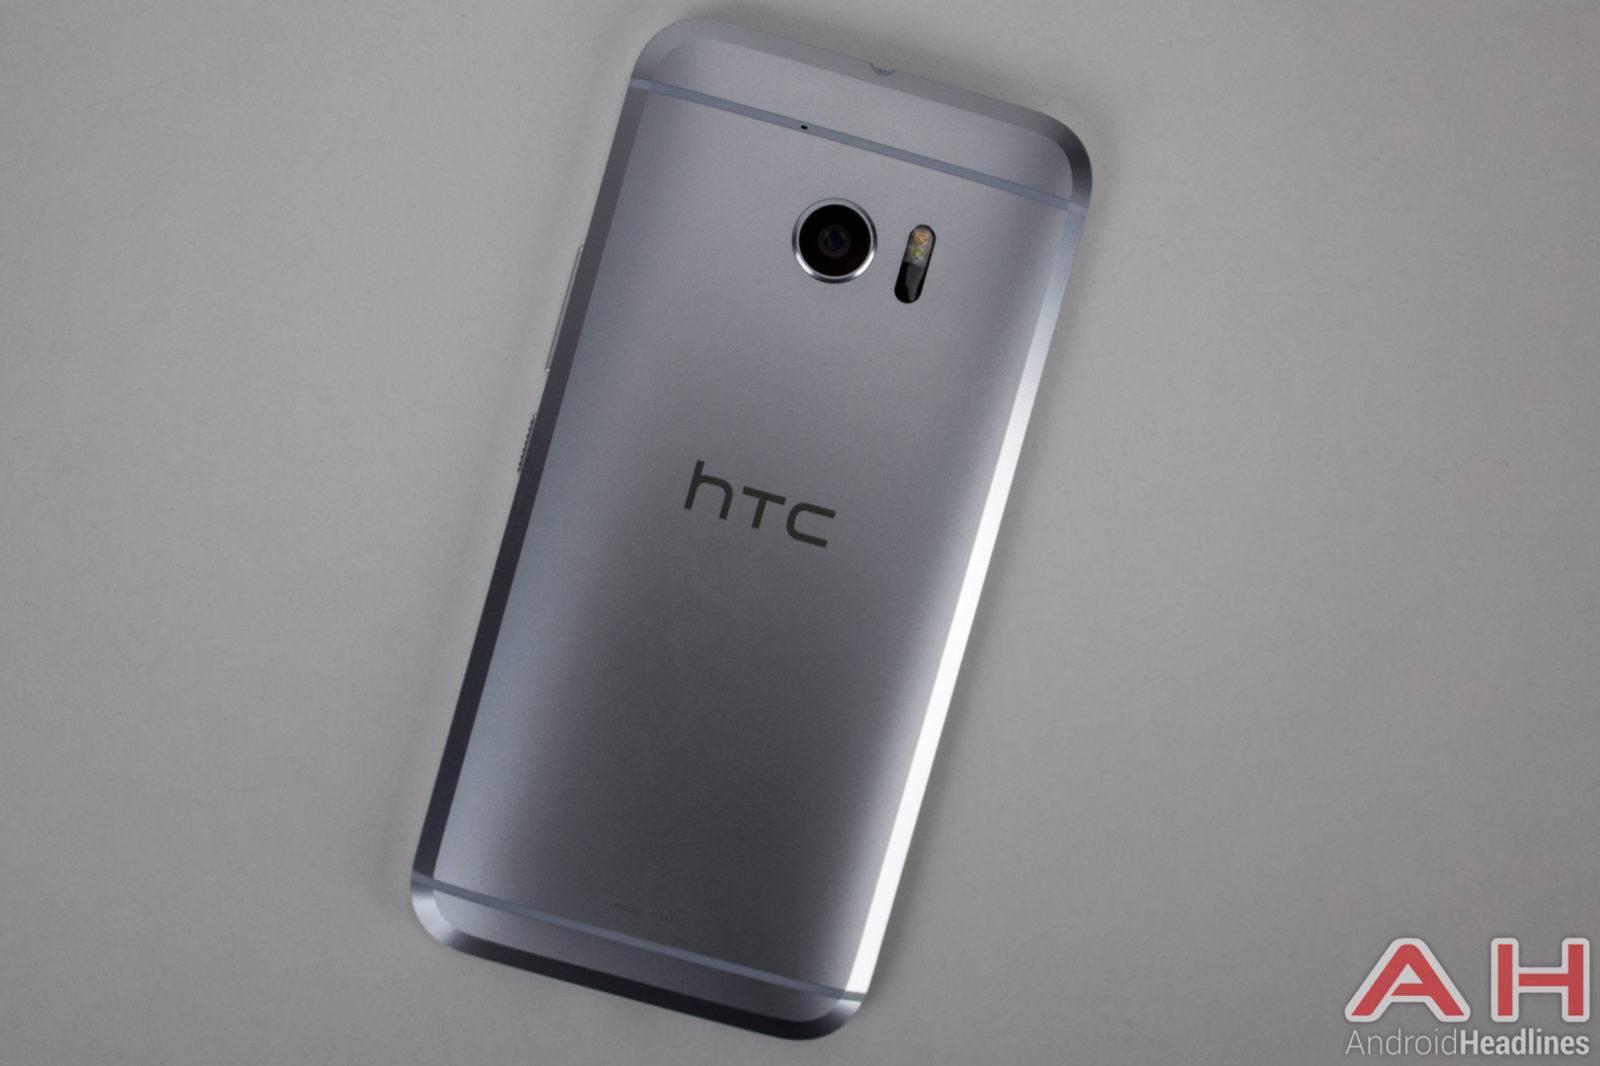 HTC-10-AH-NS-01-logo